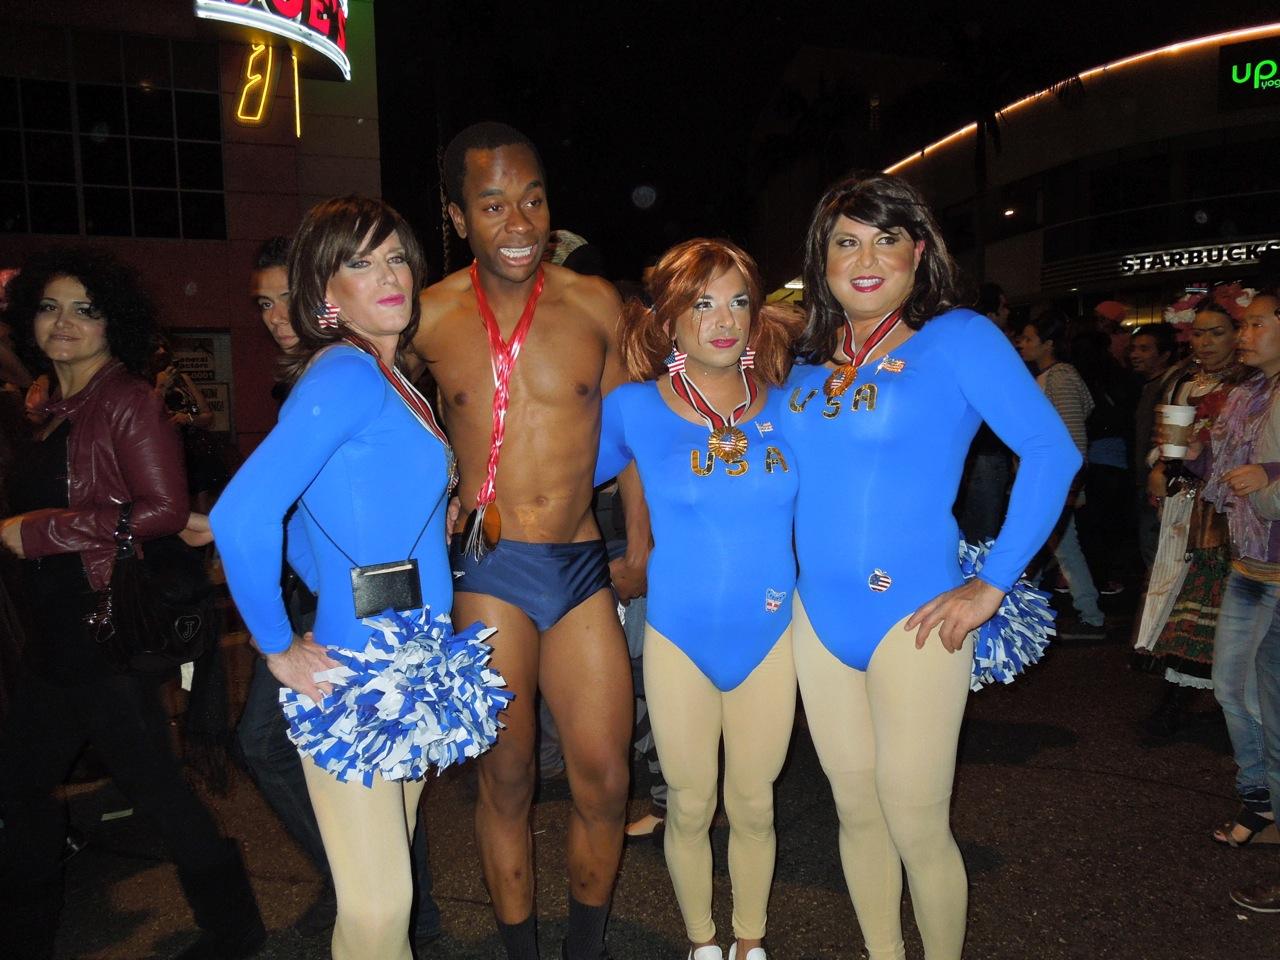 olympic team usa west hollywood halloween carnaval